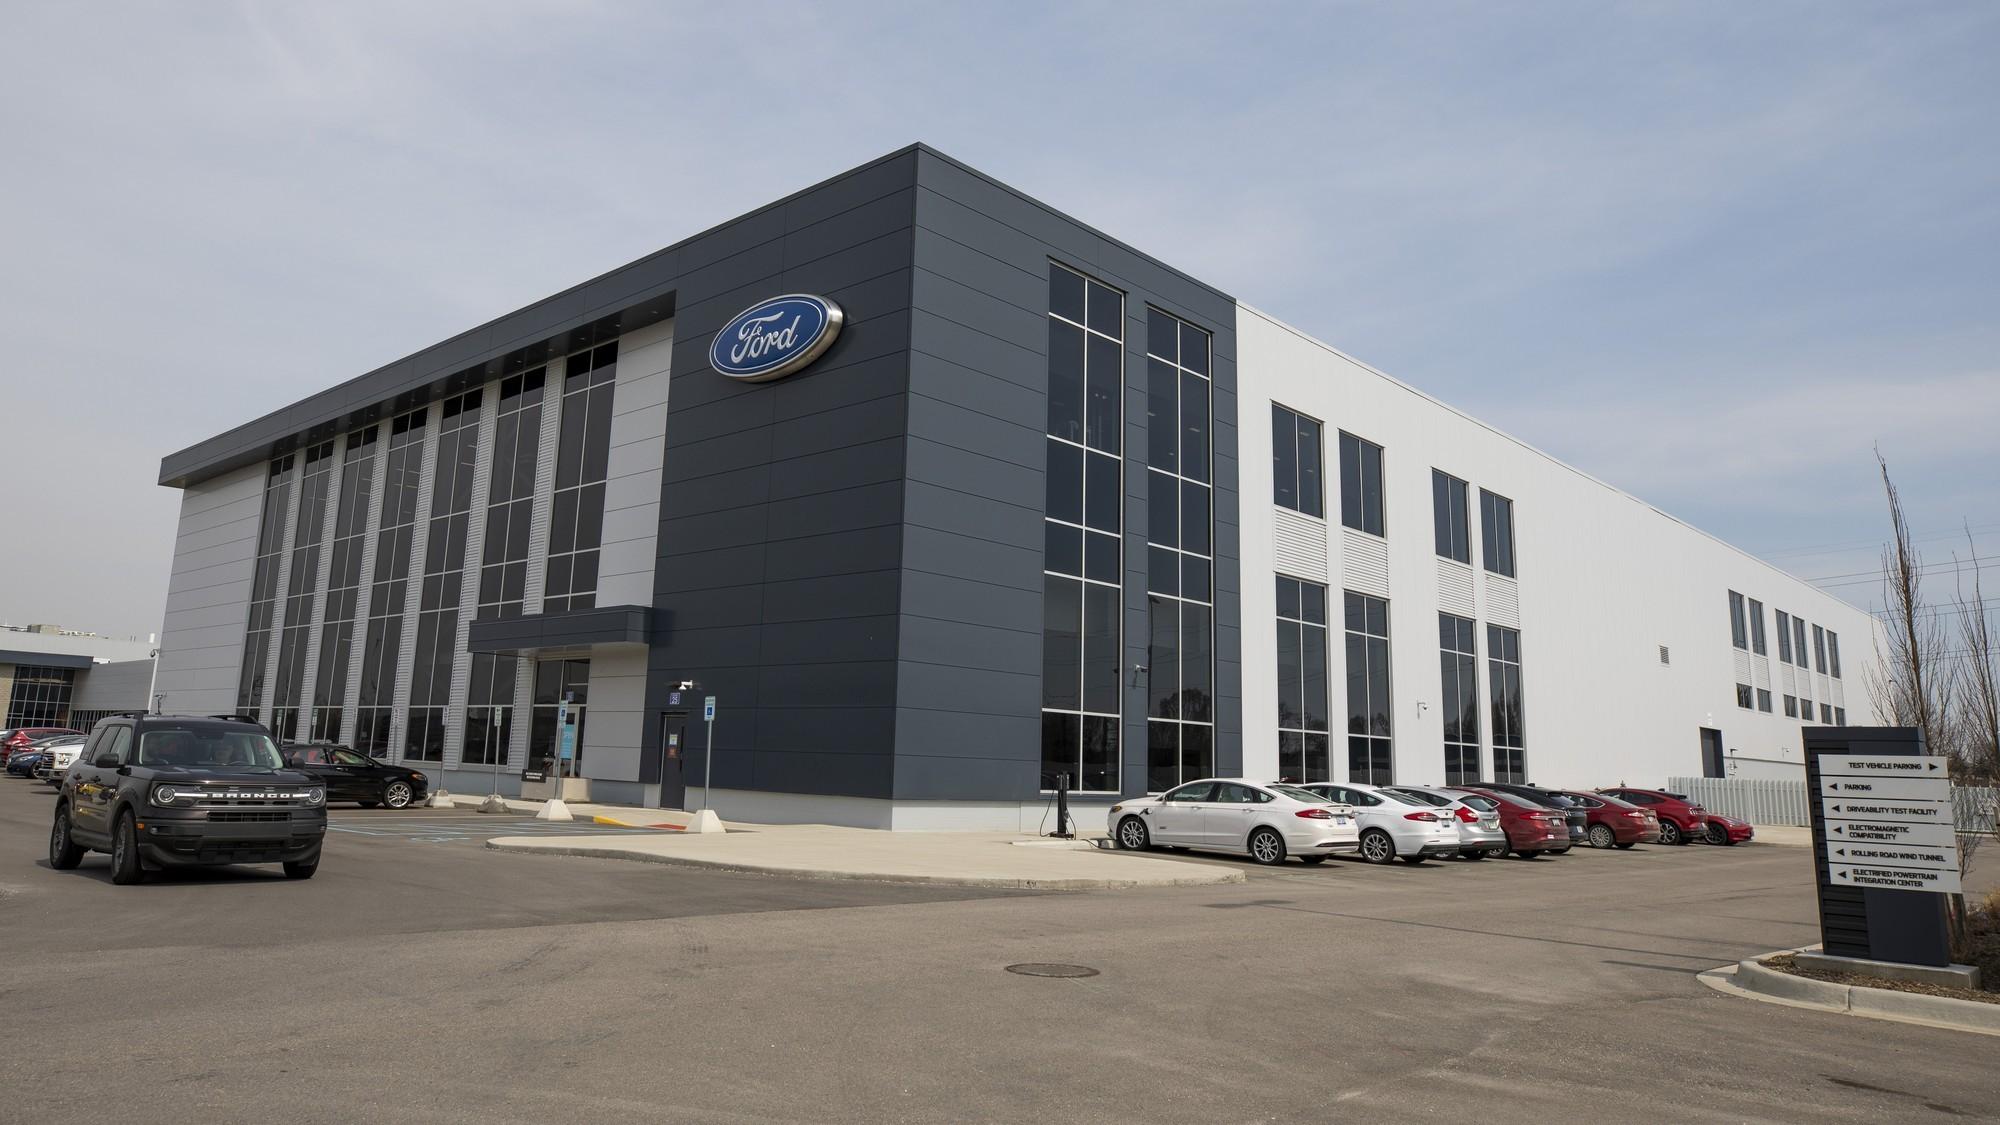 Признали ошибку: Ford будет сам делать батареи для своих электромобилей